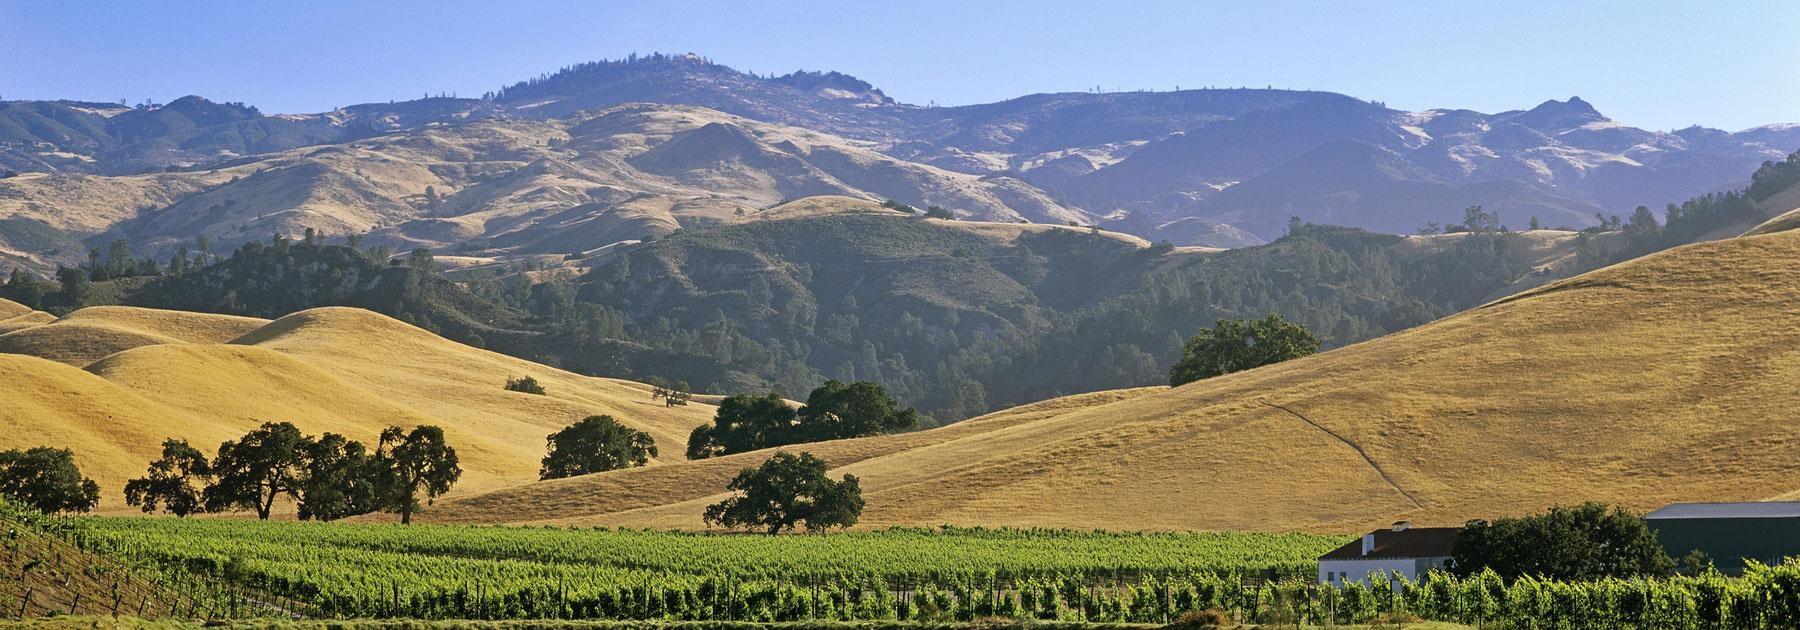 California: Santa Barbara Wine Country